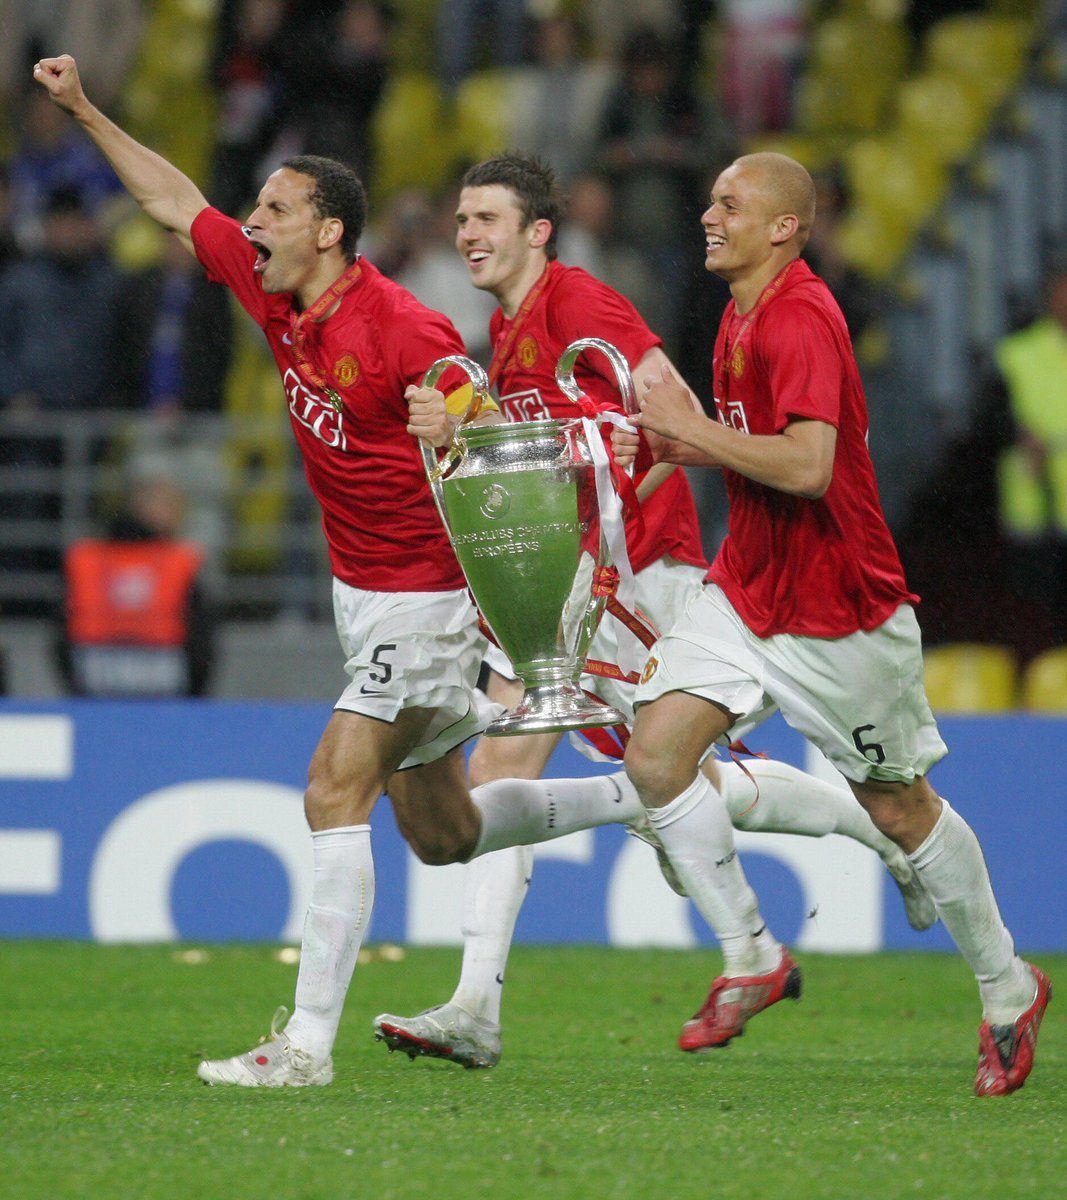 Uefa Champions League On Twitter Happy Birthday 2008